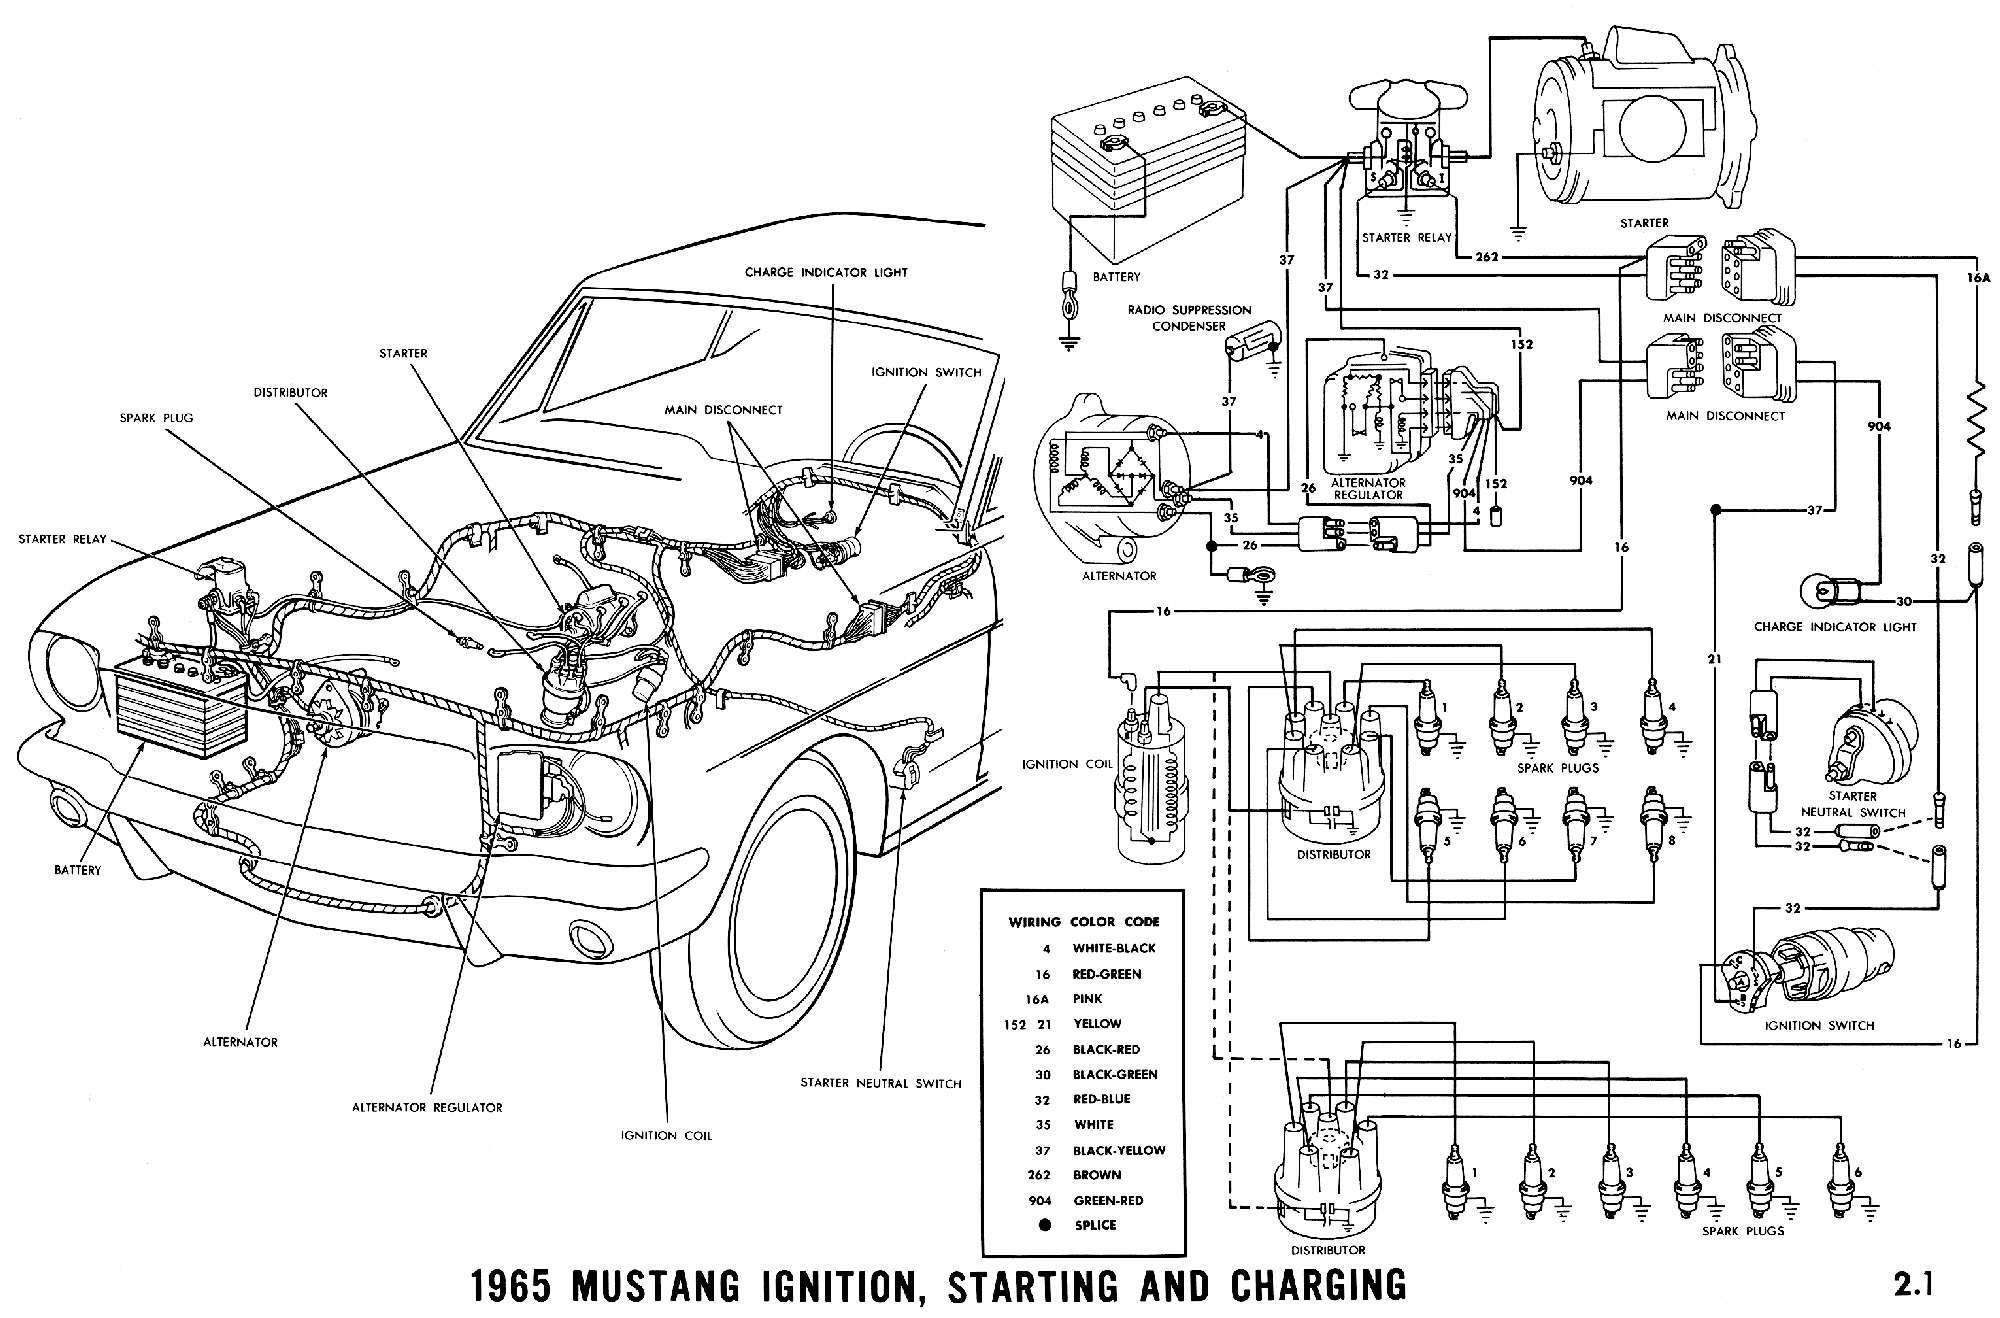 ford 4 6 dohc engine diagram automotive block diagram u2022 rh  carwiringdiagram today 2000 Ford Mustang Engine Diagram 2004 Ford Mustang  Engine Diagram